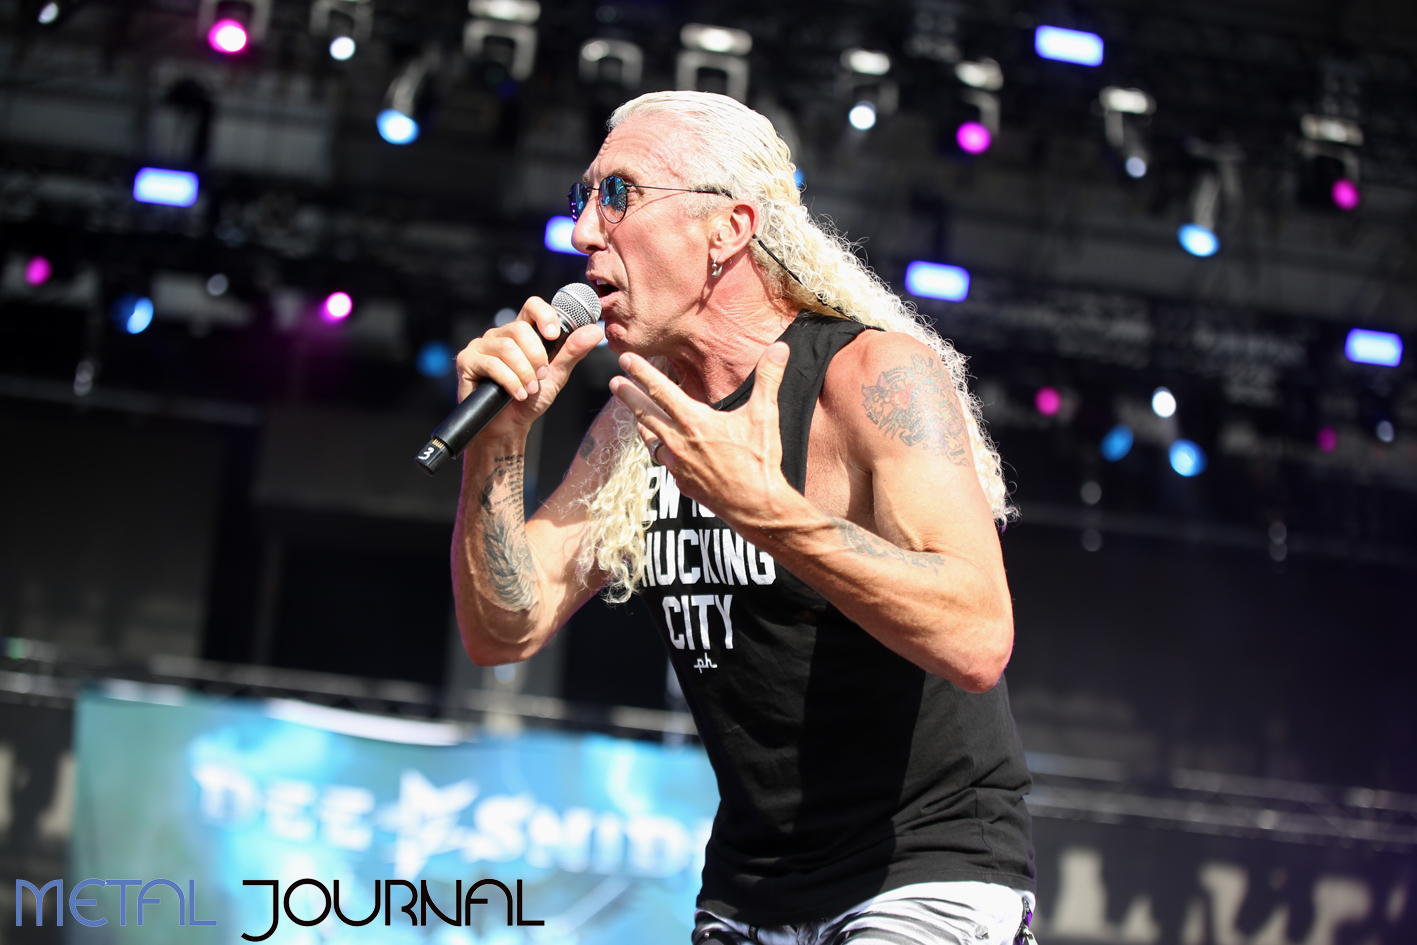 dee snider rock fest 18 - metal journal pic 2